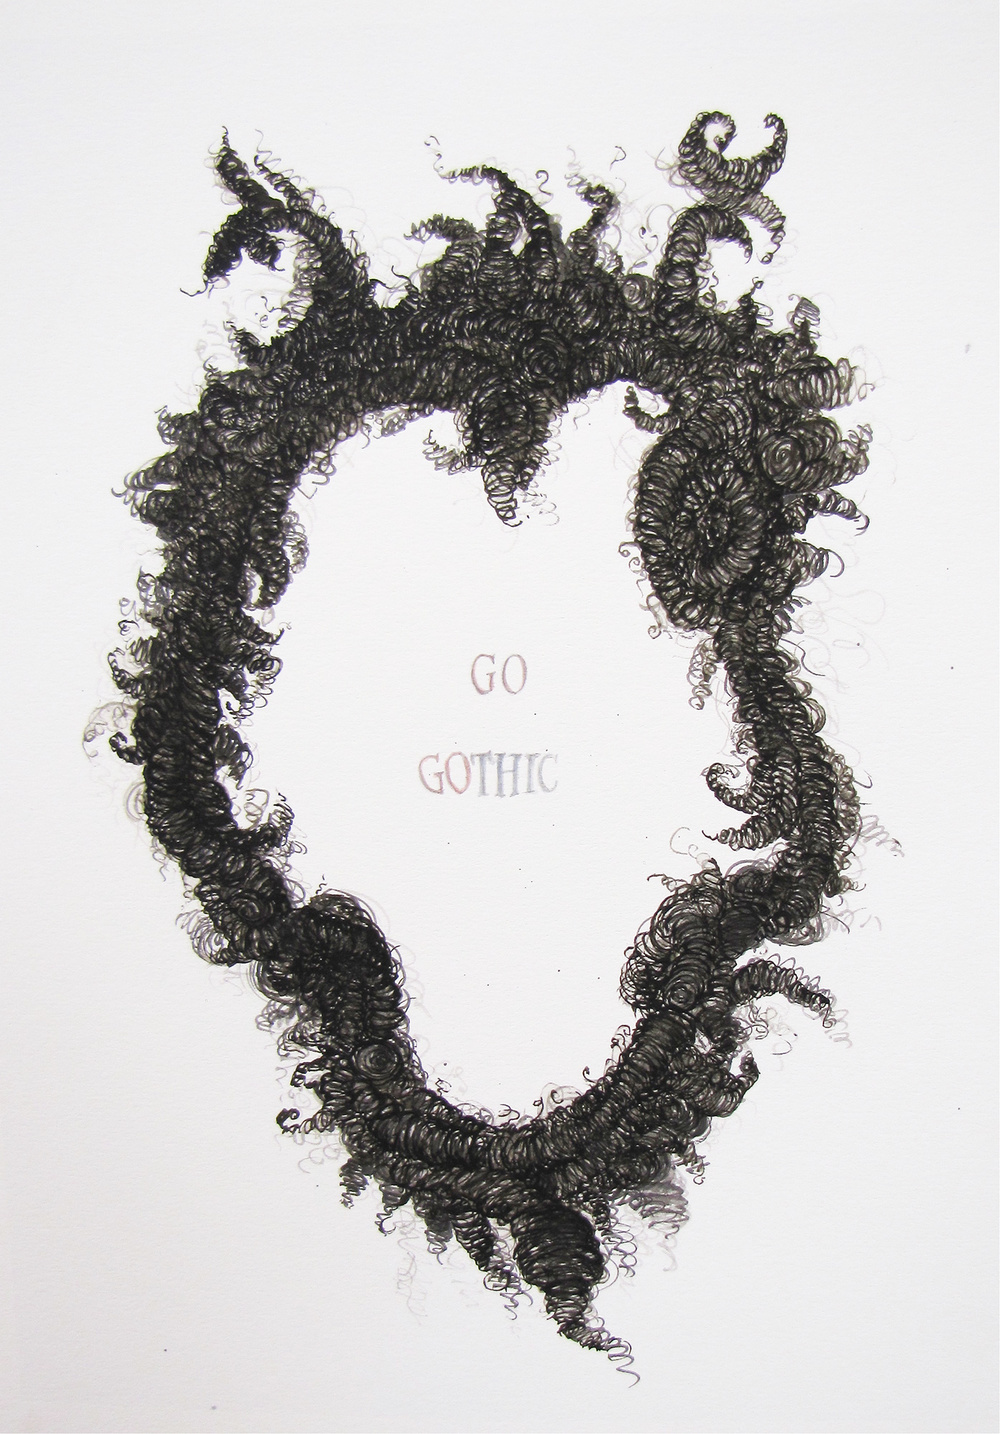 Go gothic 2012